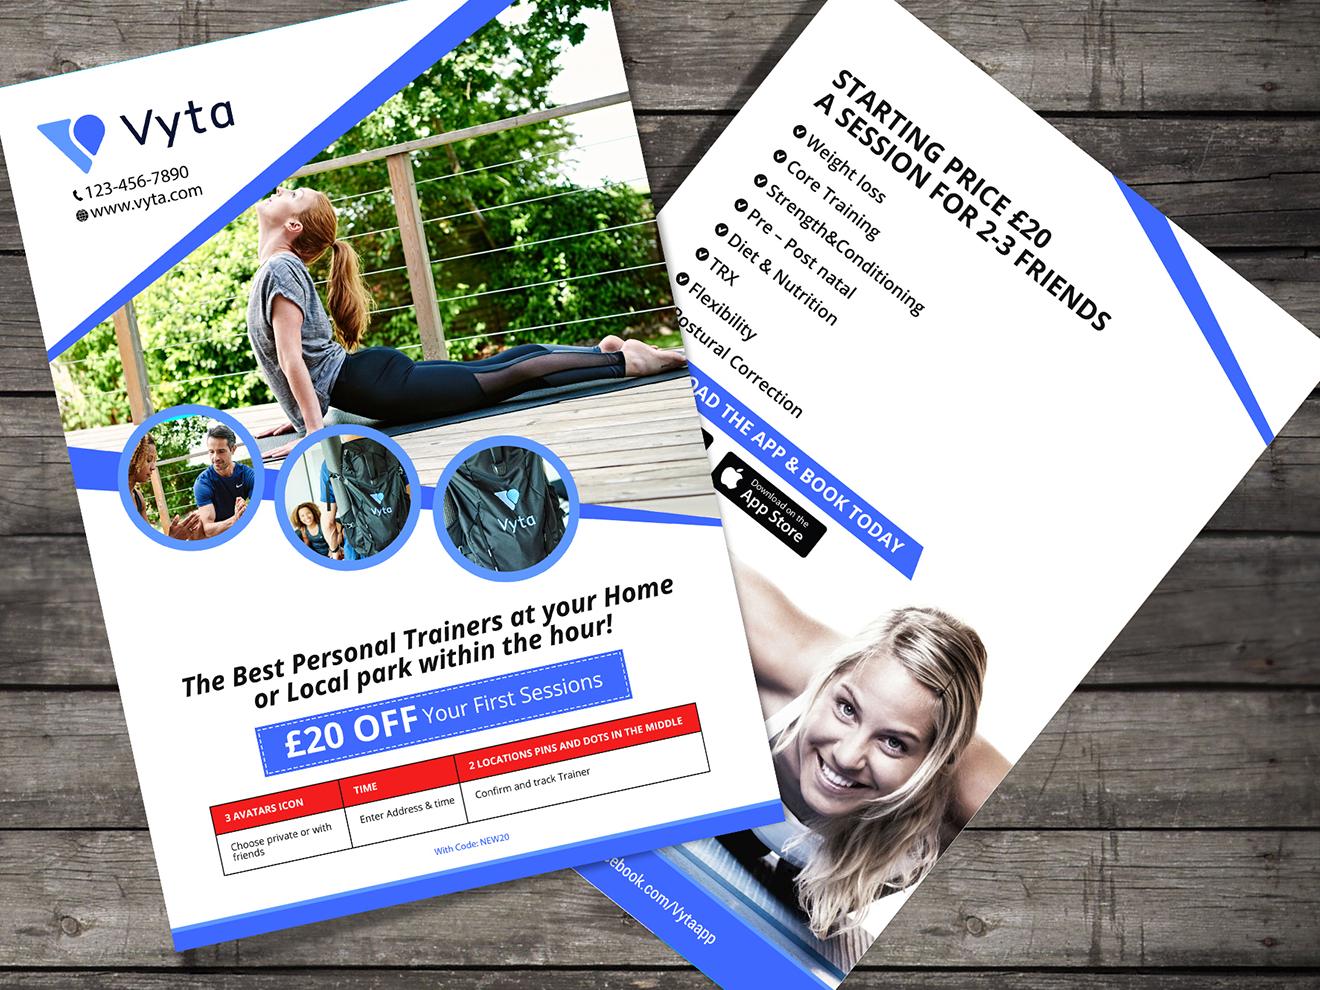 Vyta Flyer Design flyers fab flyer post card design icon branding ad flyer design flyer advertisement advertise